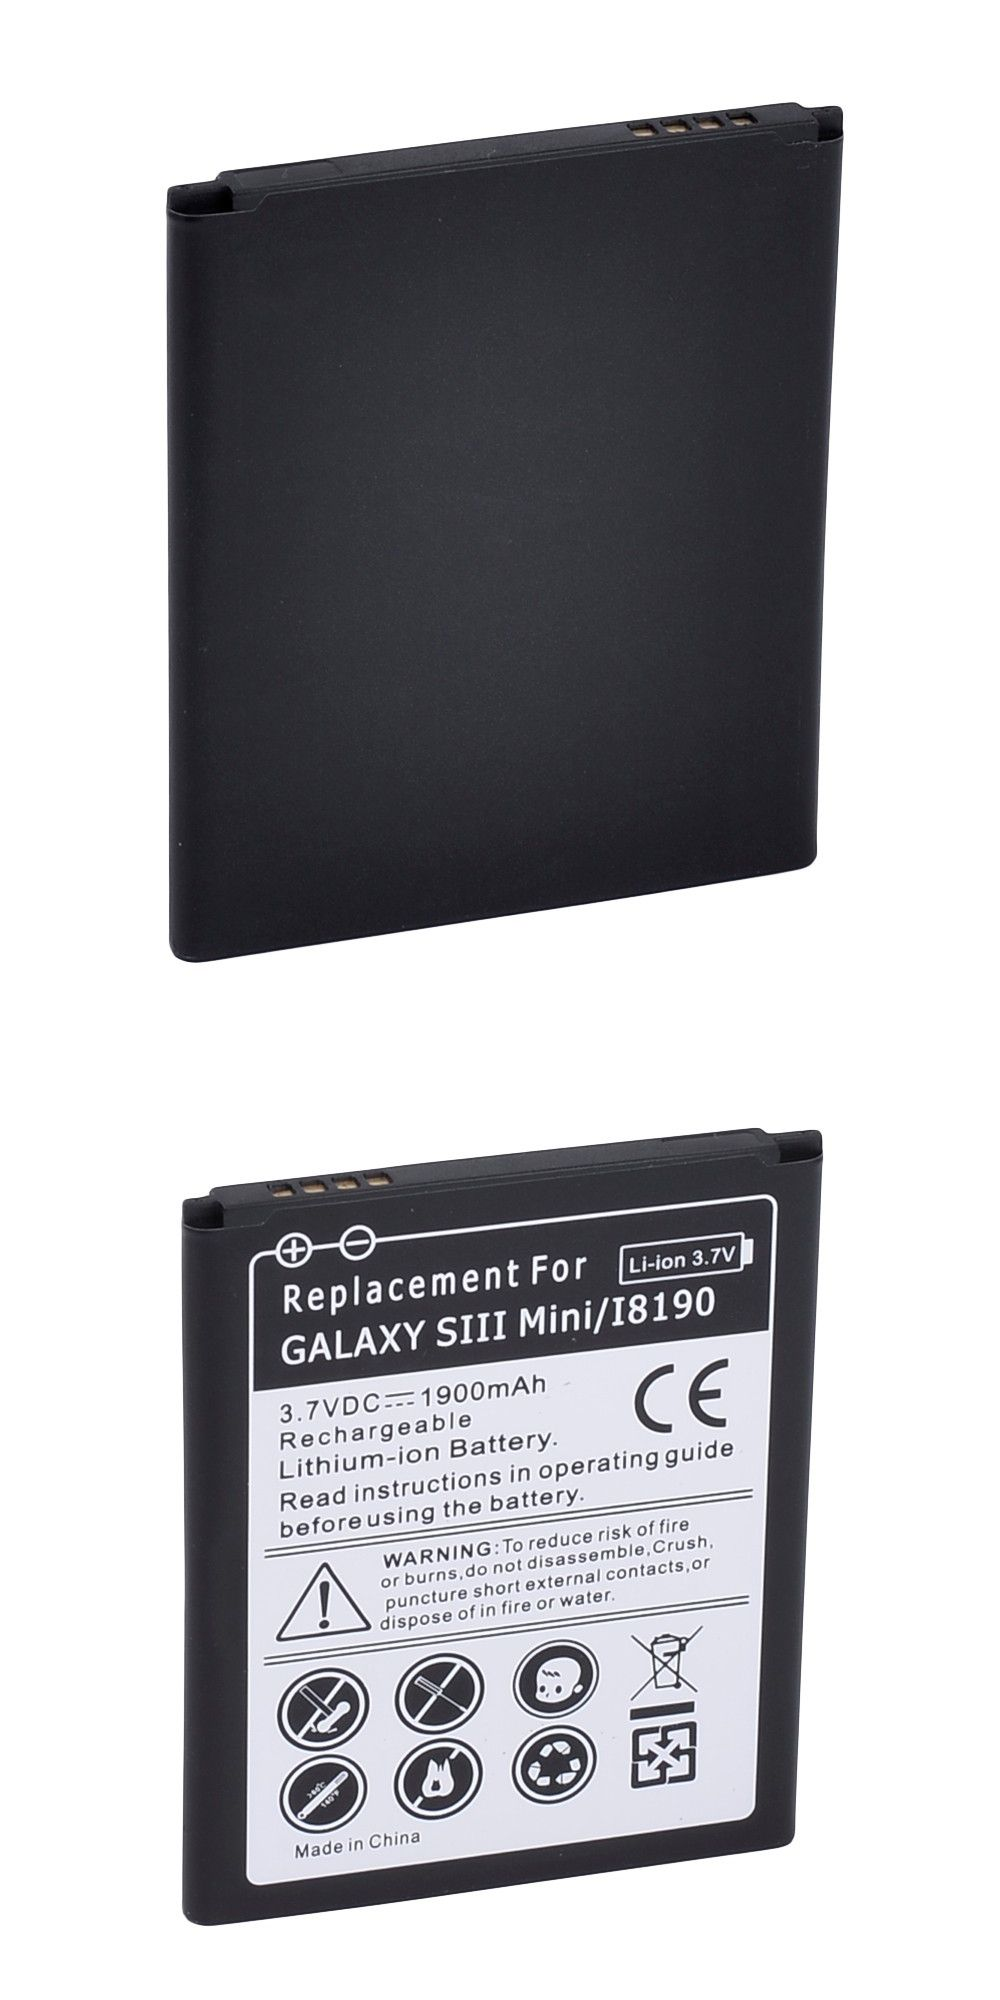 3 7VDC 1900mAh for Samsung Galaxy S3 mini battery mobile phone Batteries for samsung galaxy SIII